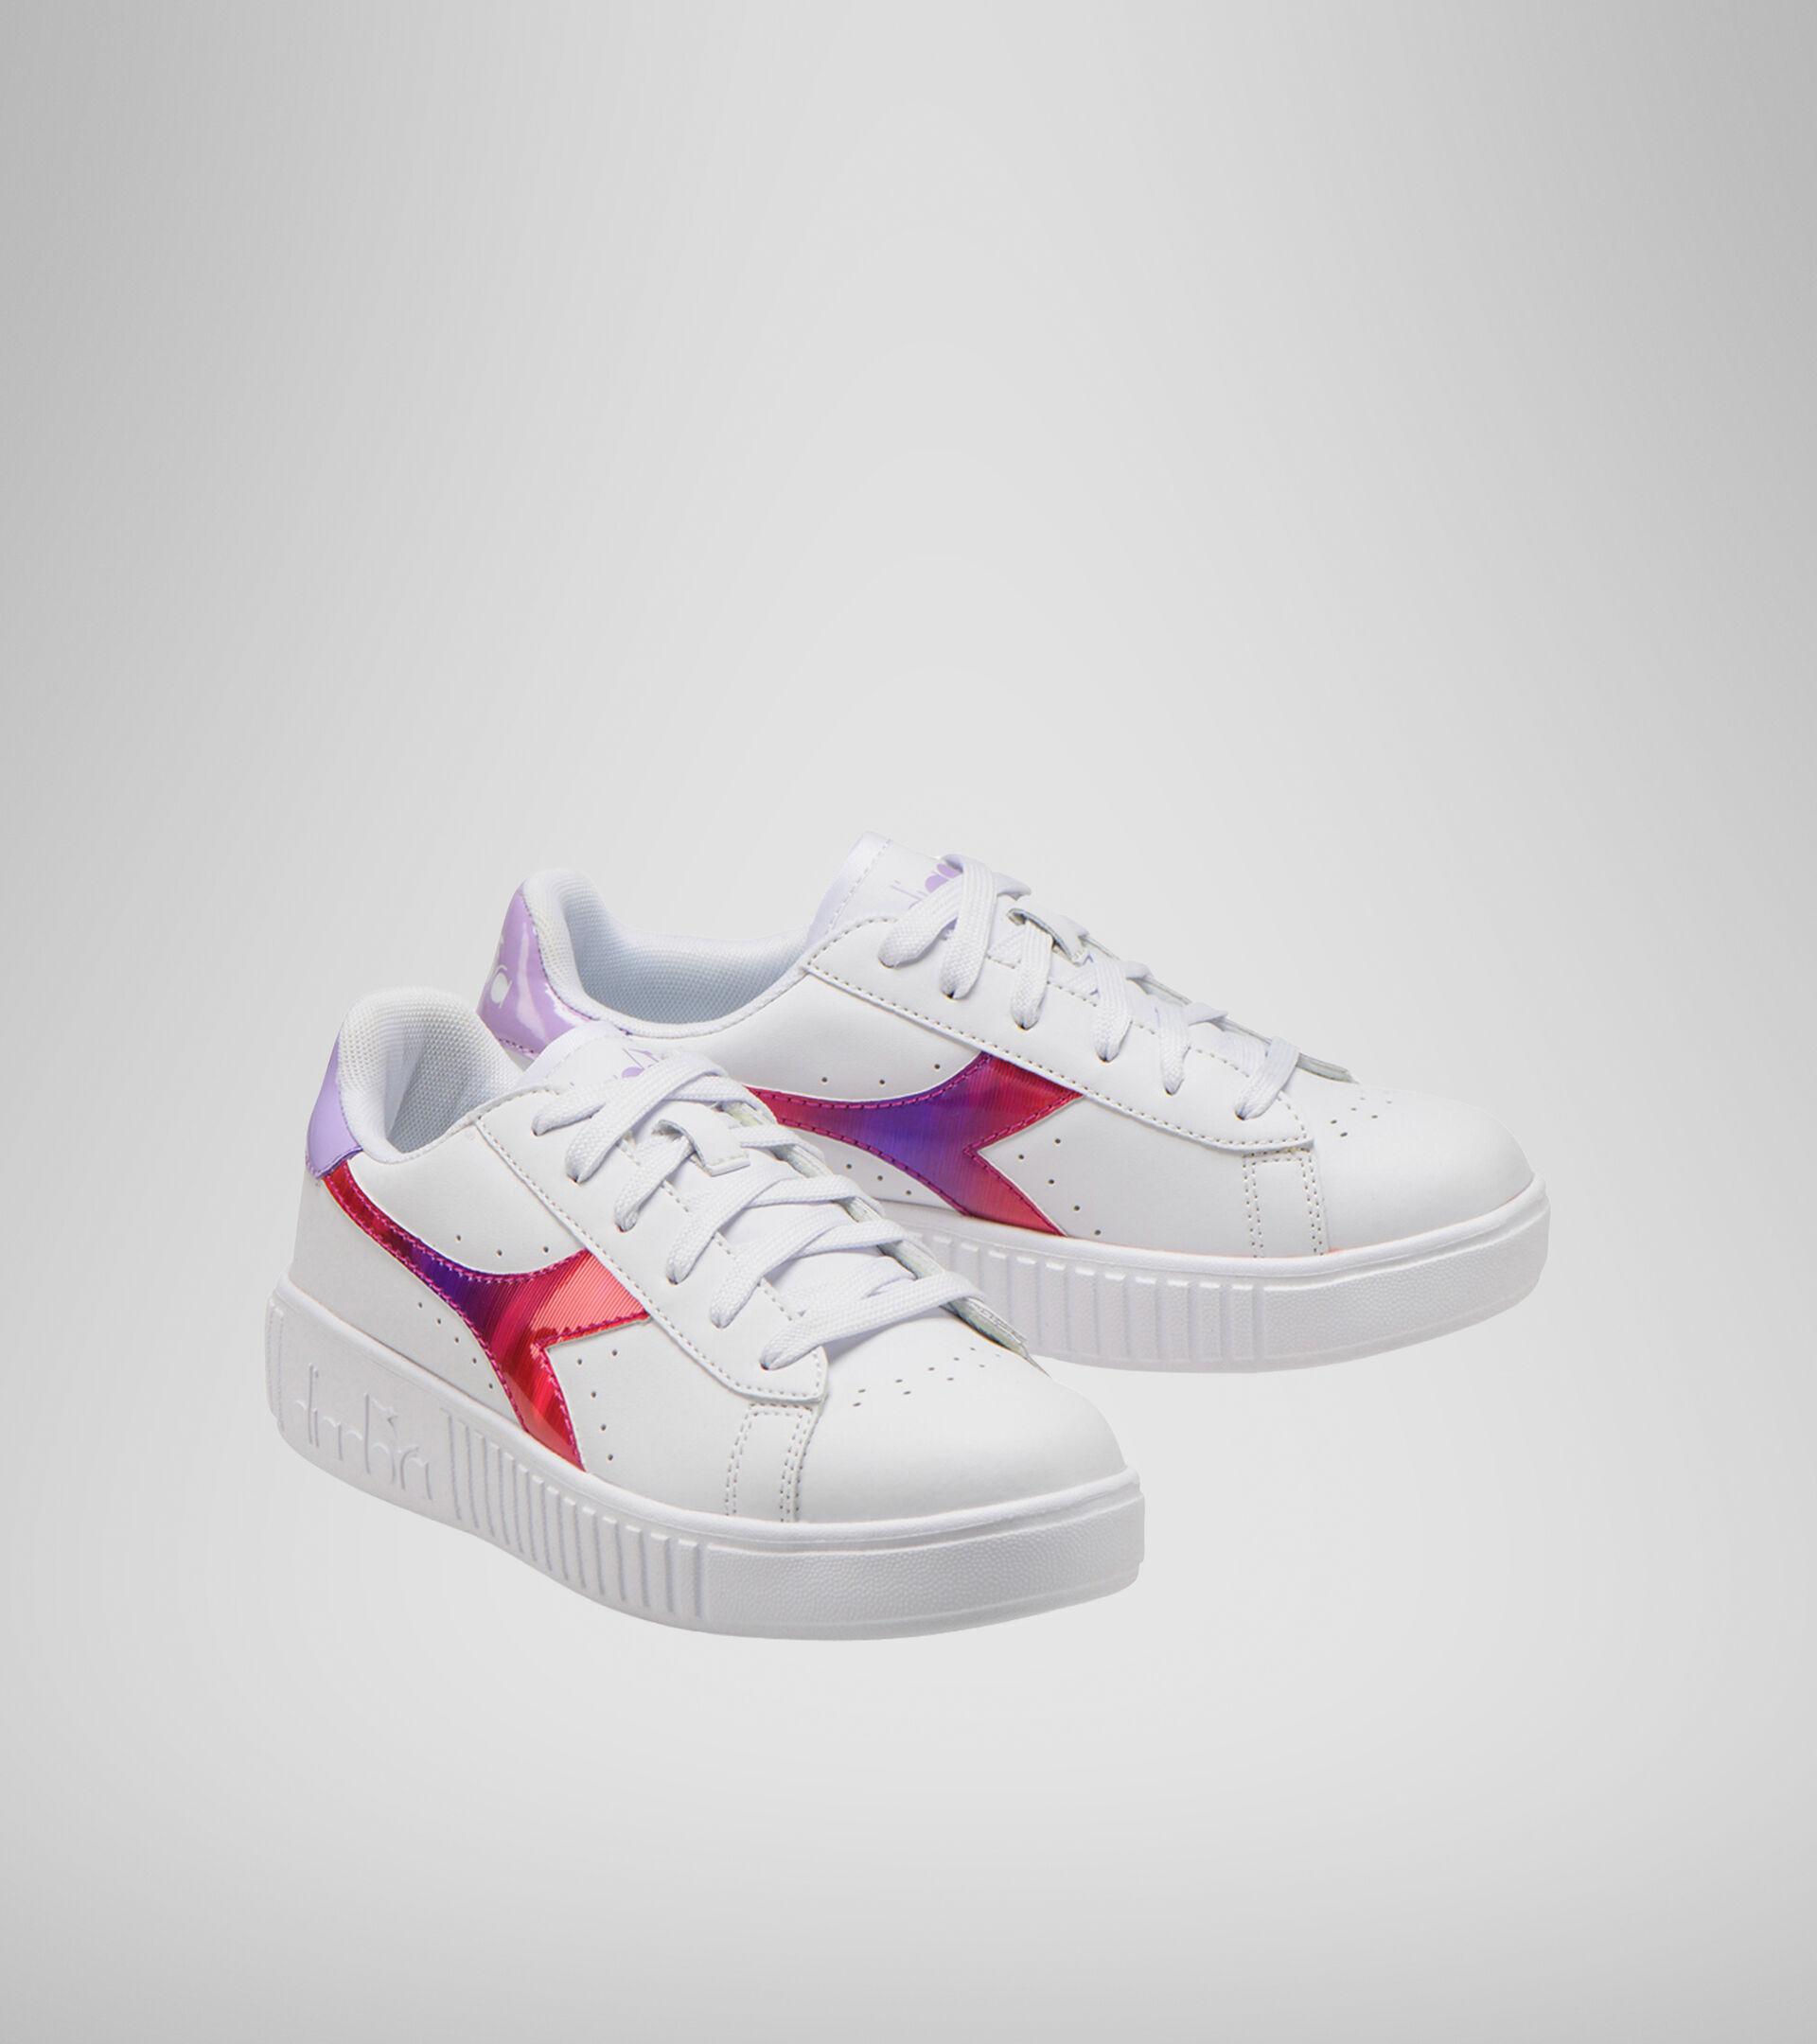 Chaussures de sport - Jeunes 8-16 ans GAME STEP RAINBOW GS BLANC/VIOLET LILAS - Diadora